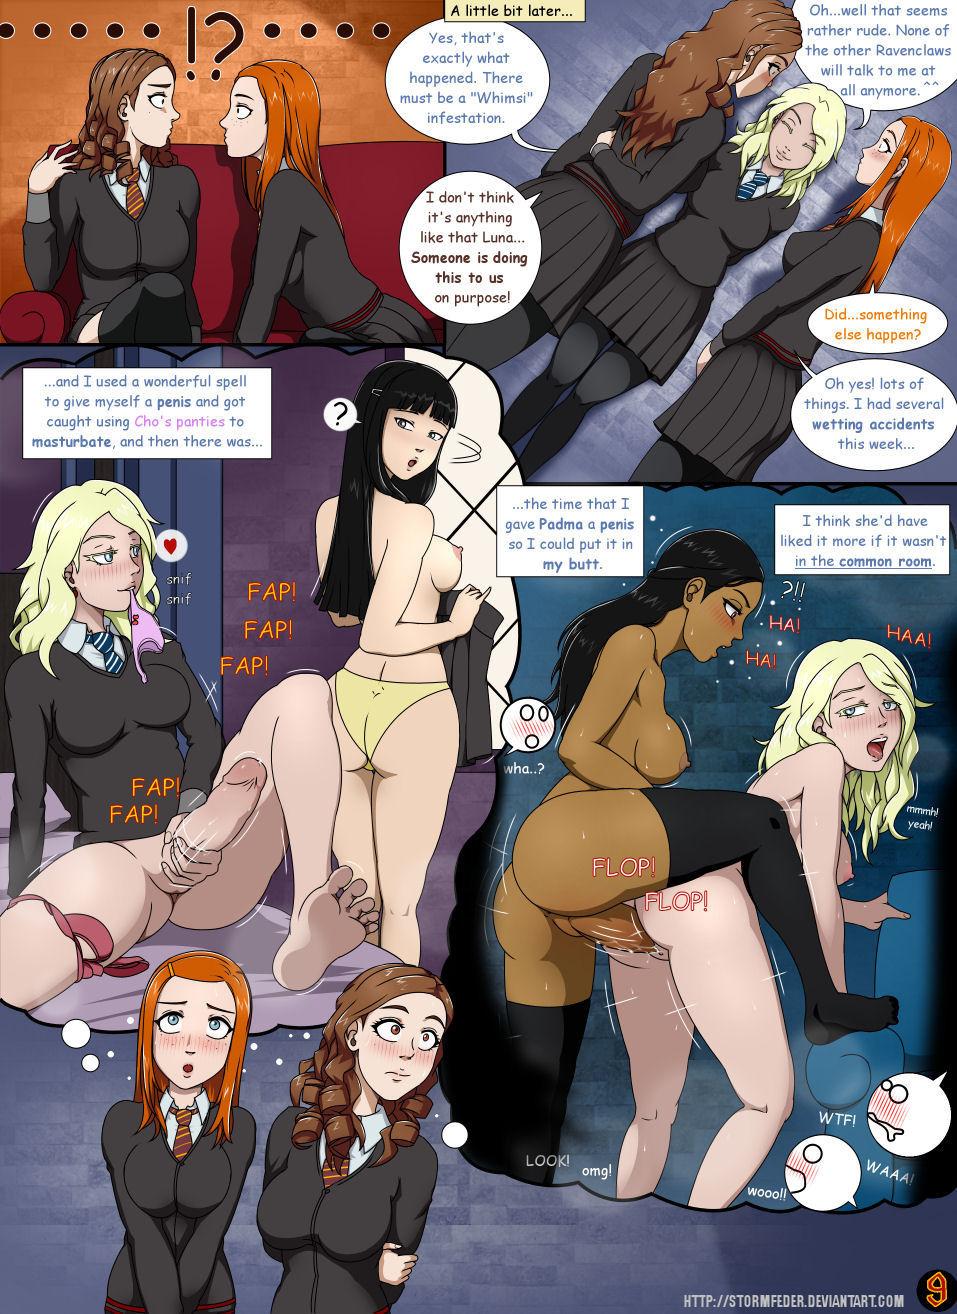 The Charm porn comics Oral sex, Anal Sex, Big Tits, Blowjob, Cum Shots, Cum Swallow, Deformed, Double Penetration, fingering, Futanari, Group Sex, Lesbians, Masturbation, Sex and Magic, Sex Toys, Stockings, Straight, Titfuck